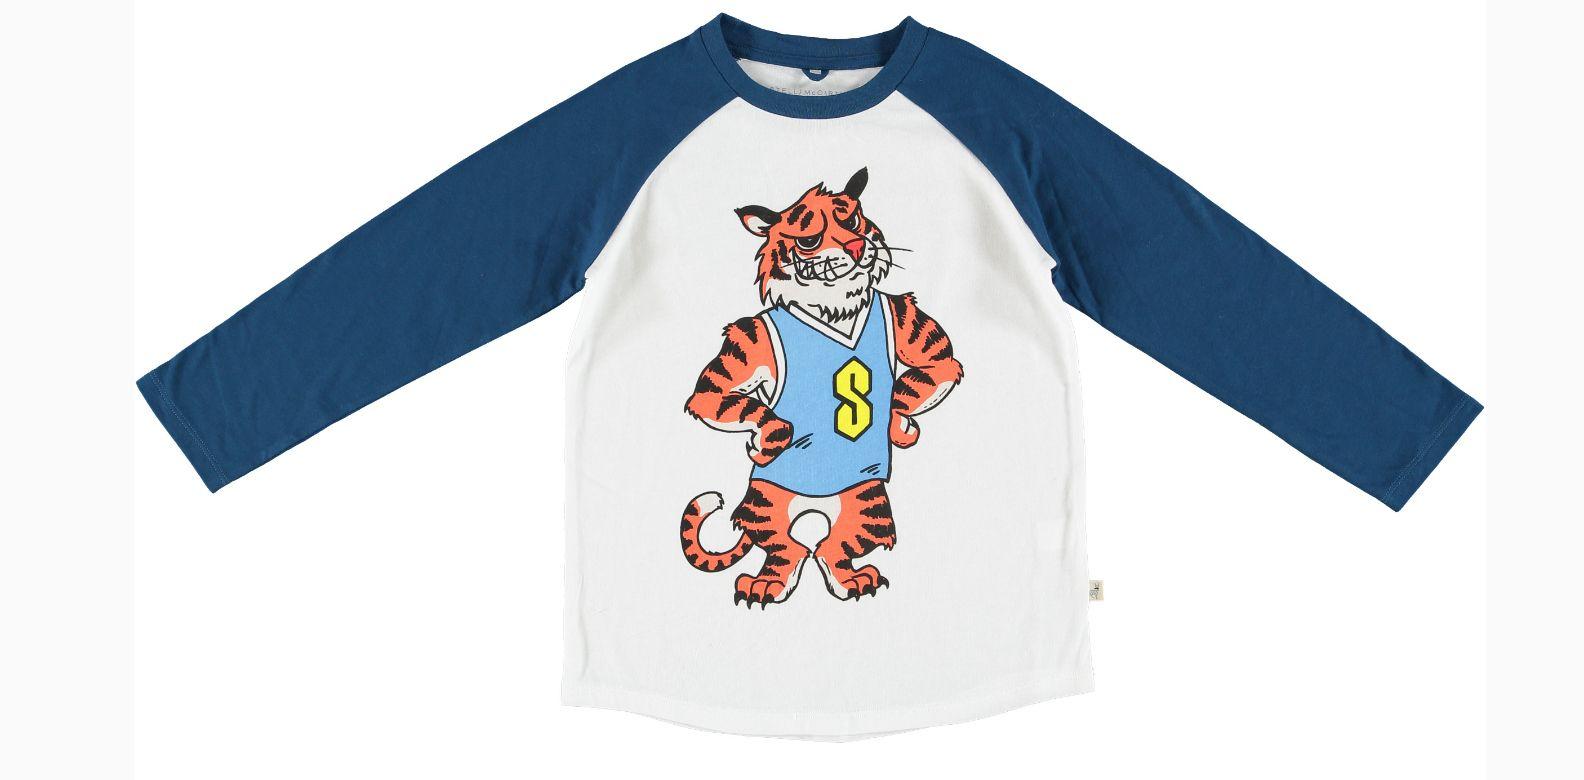 Stella McCartney Kids baby t-shirt; Kids21 B1-59 The Shoppes at Marina Bay Sands